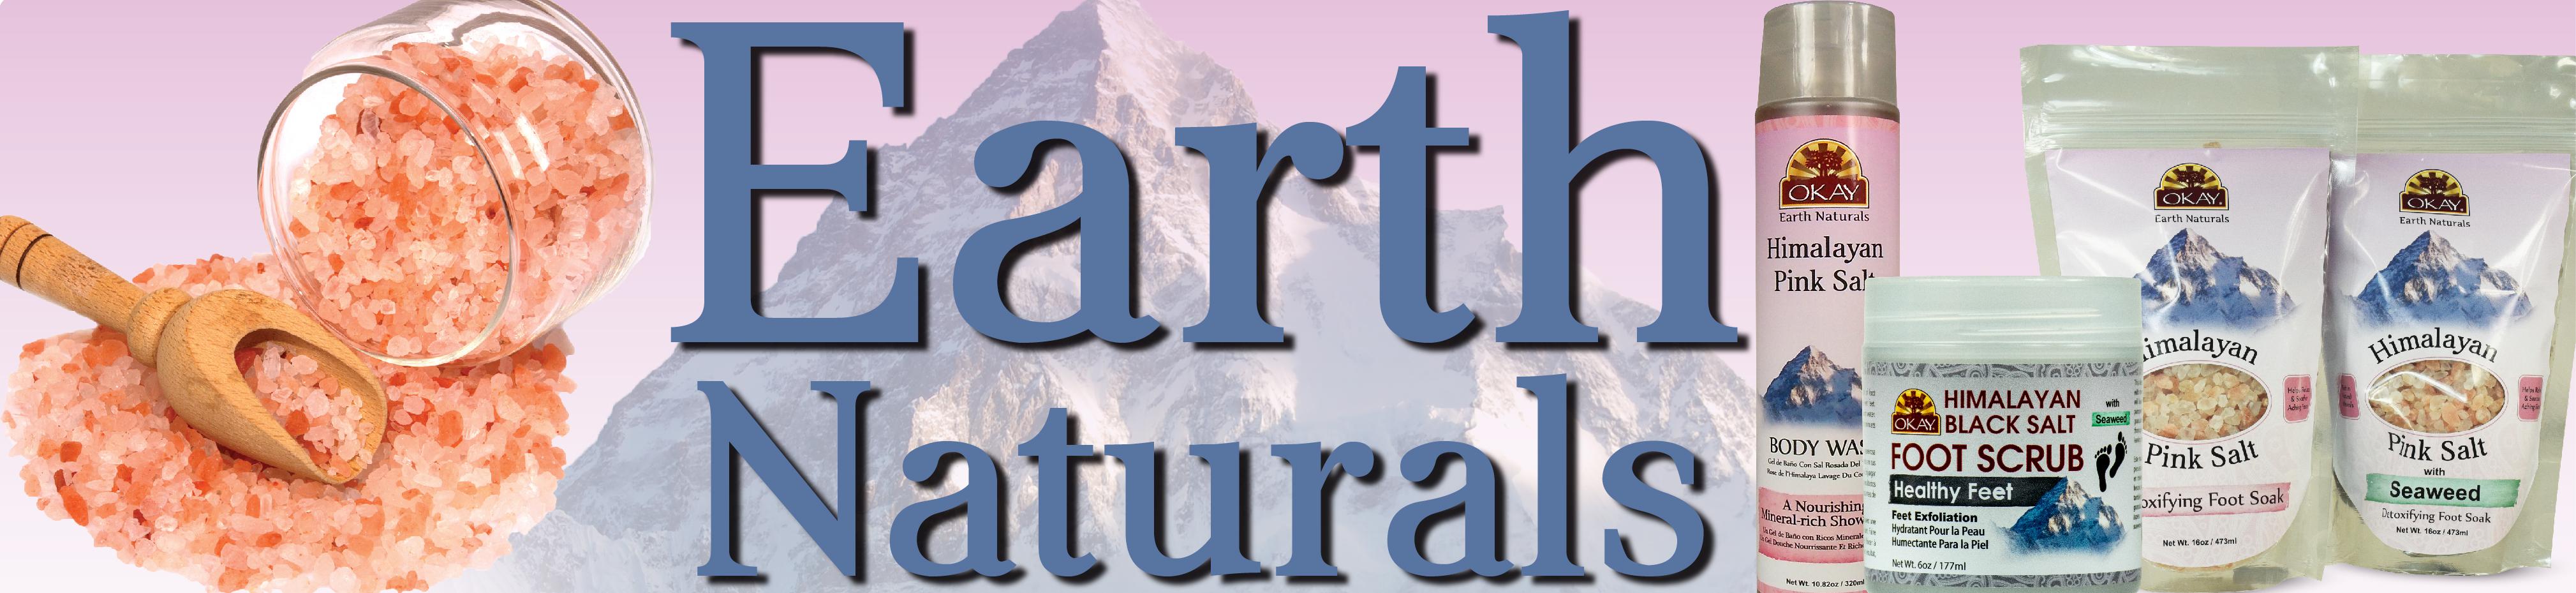 earth-naturals-07-07.jpg